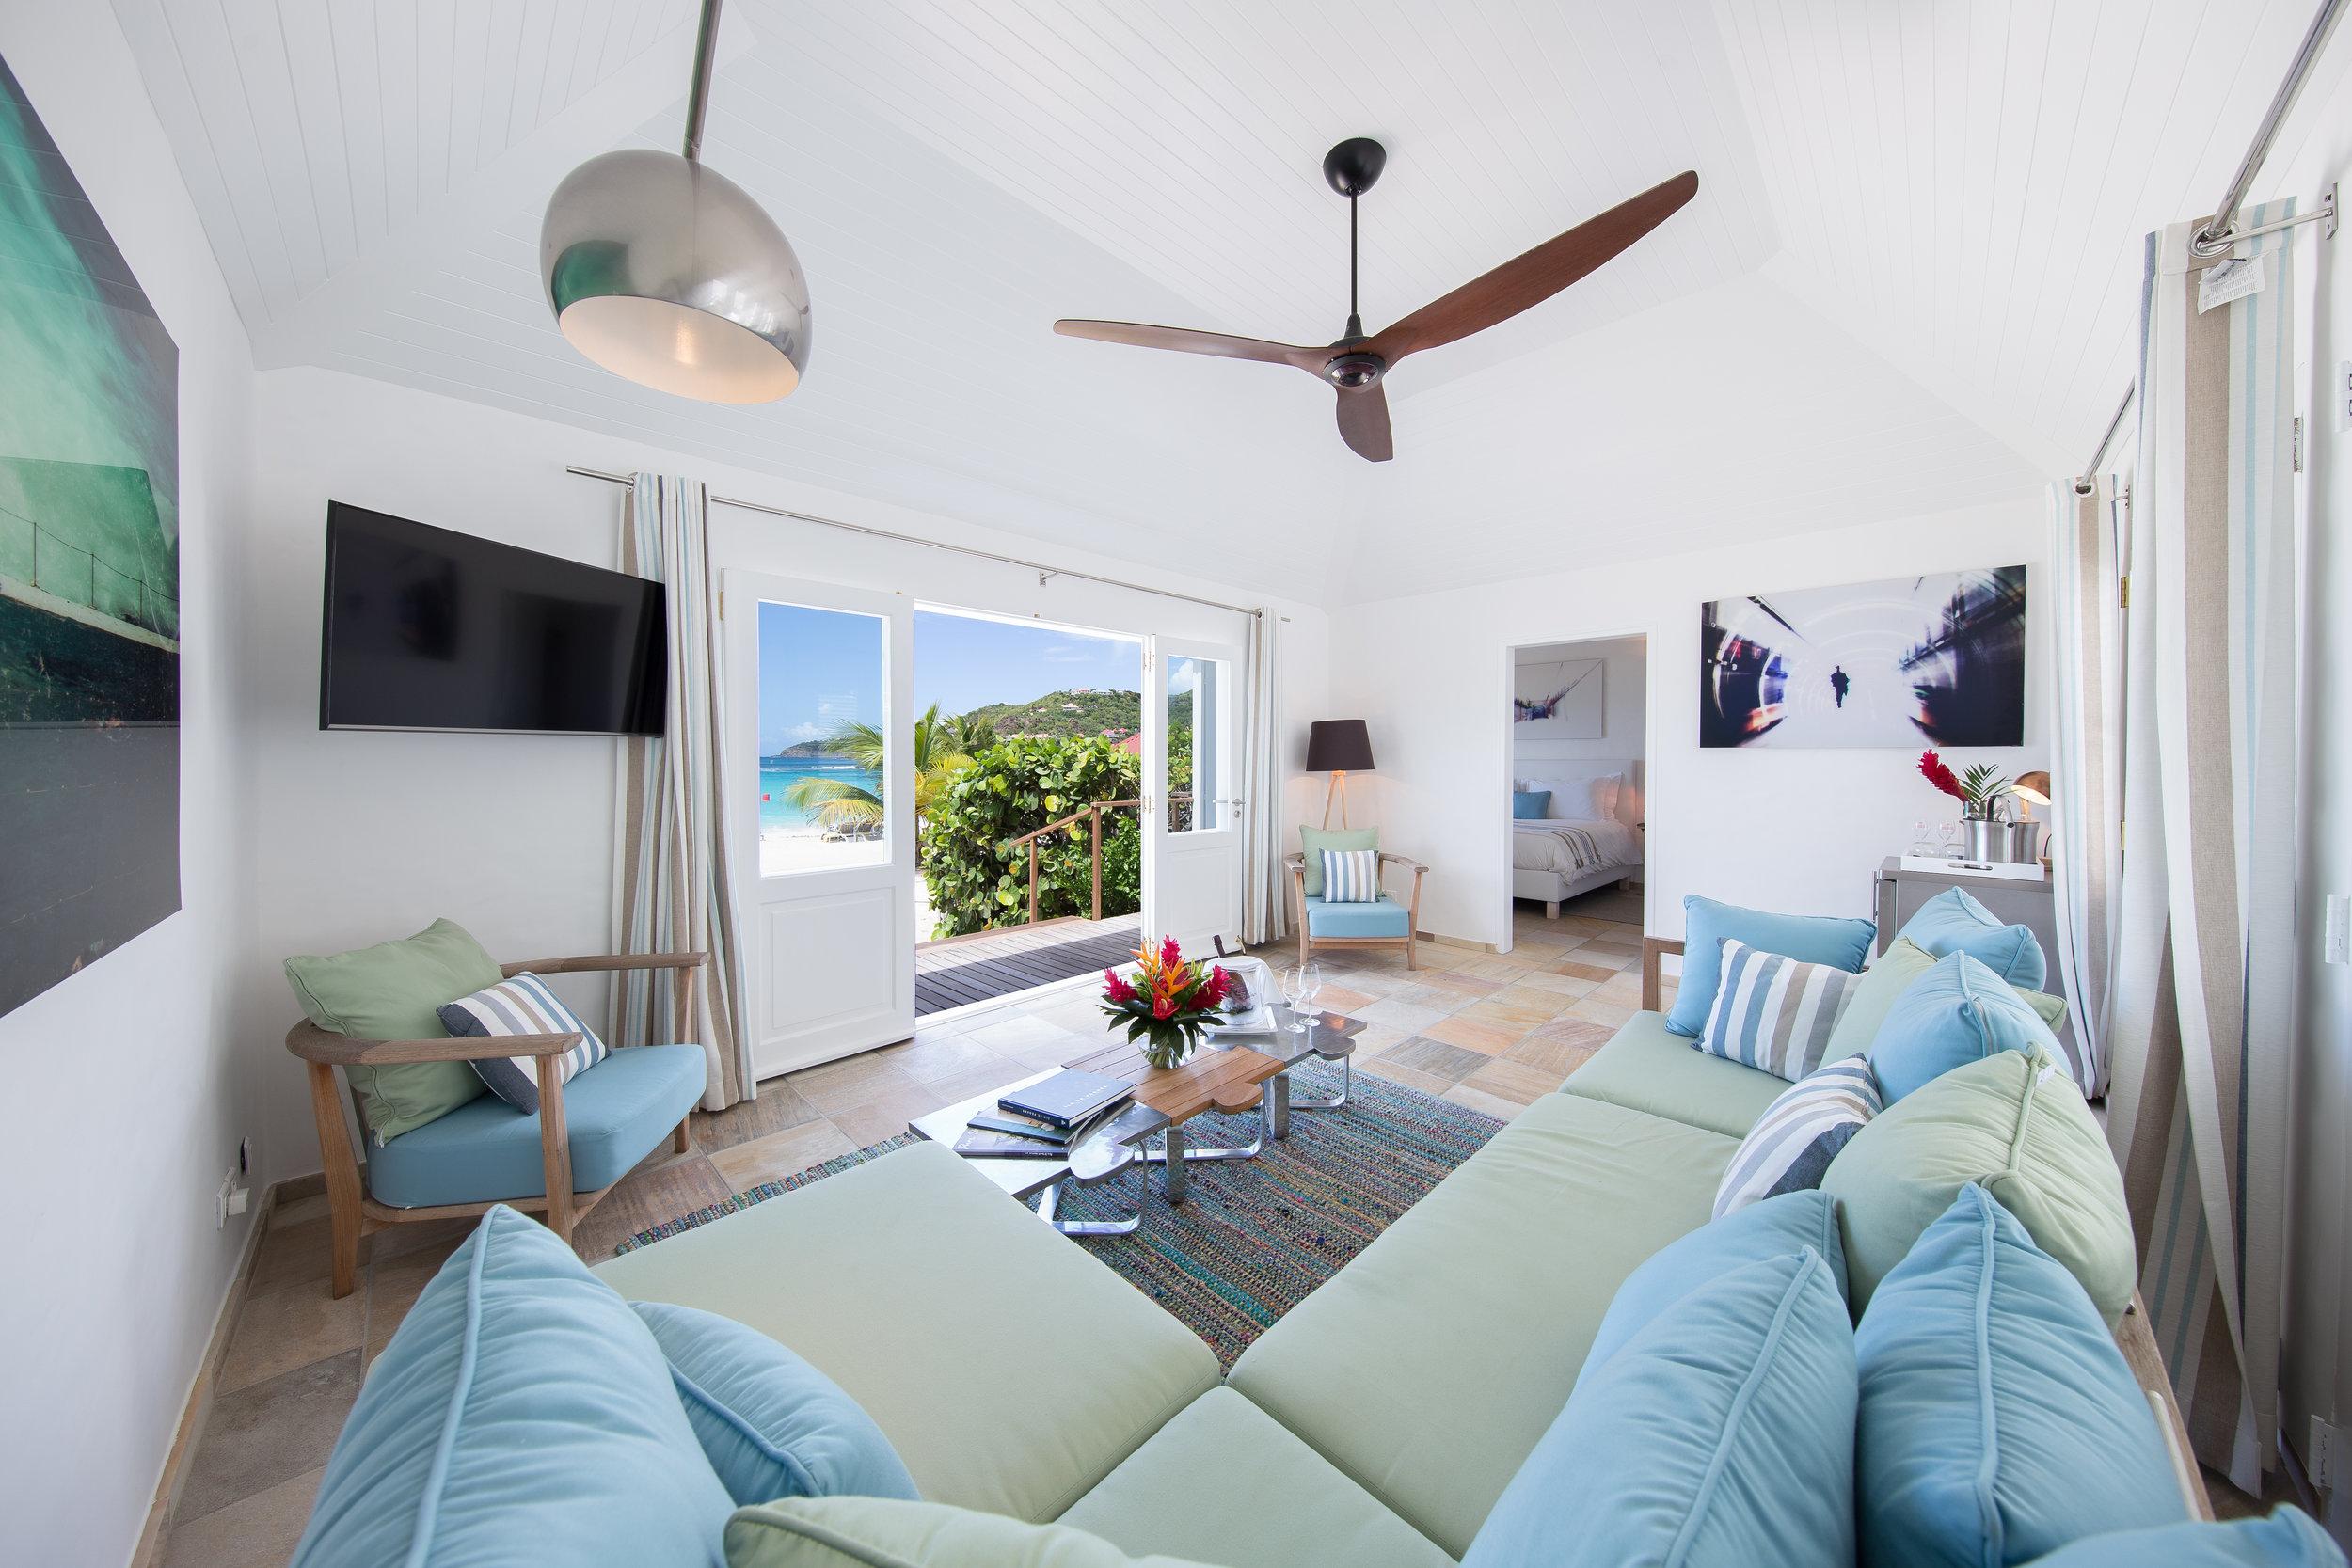 Hotel Rooms - Beach Front Suite 1.JPG